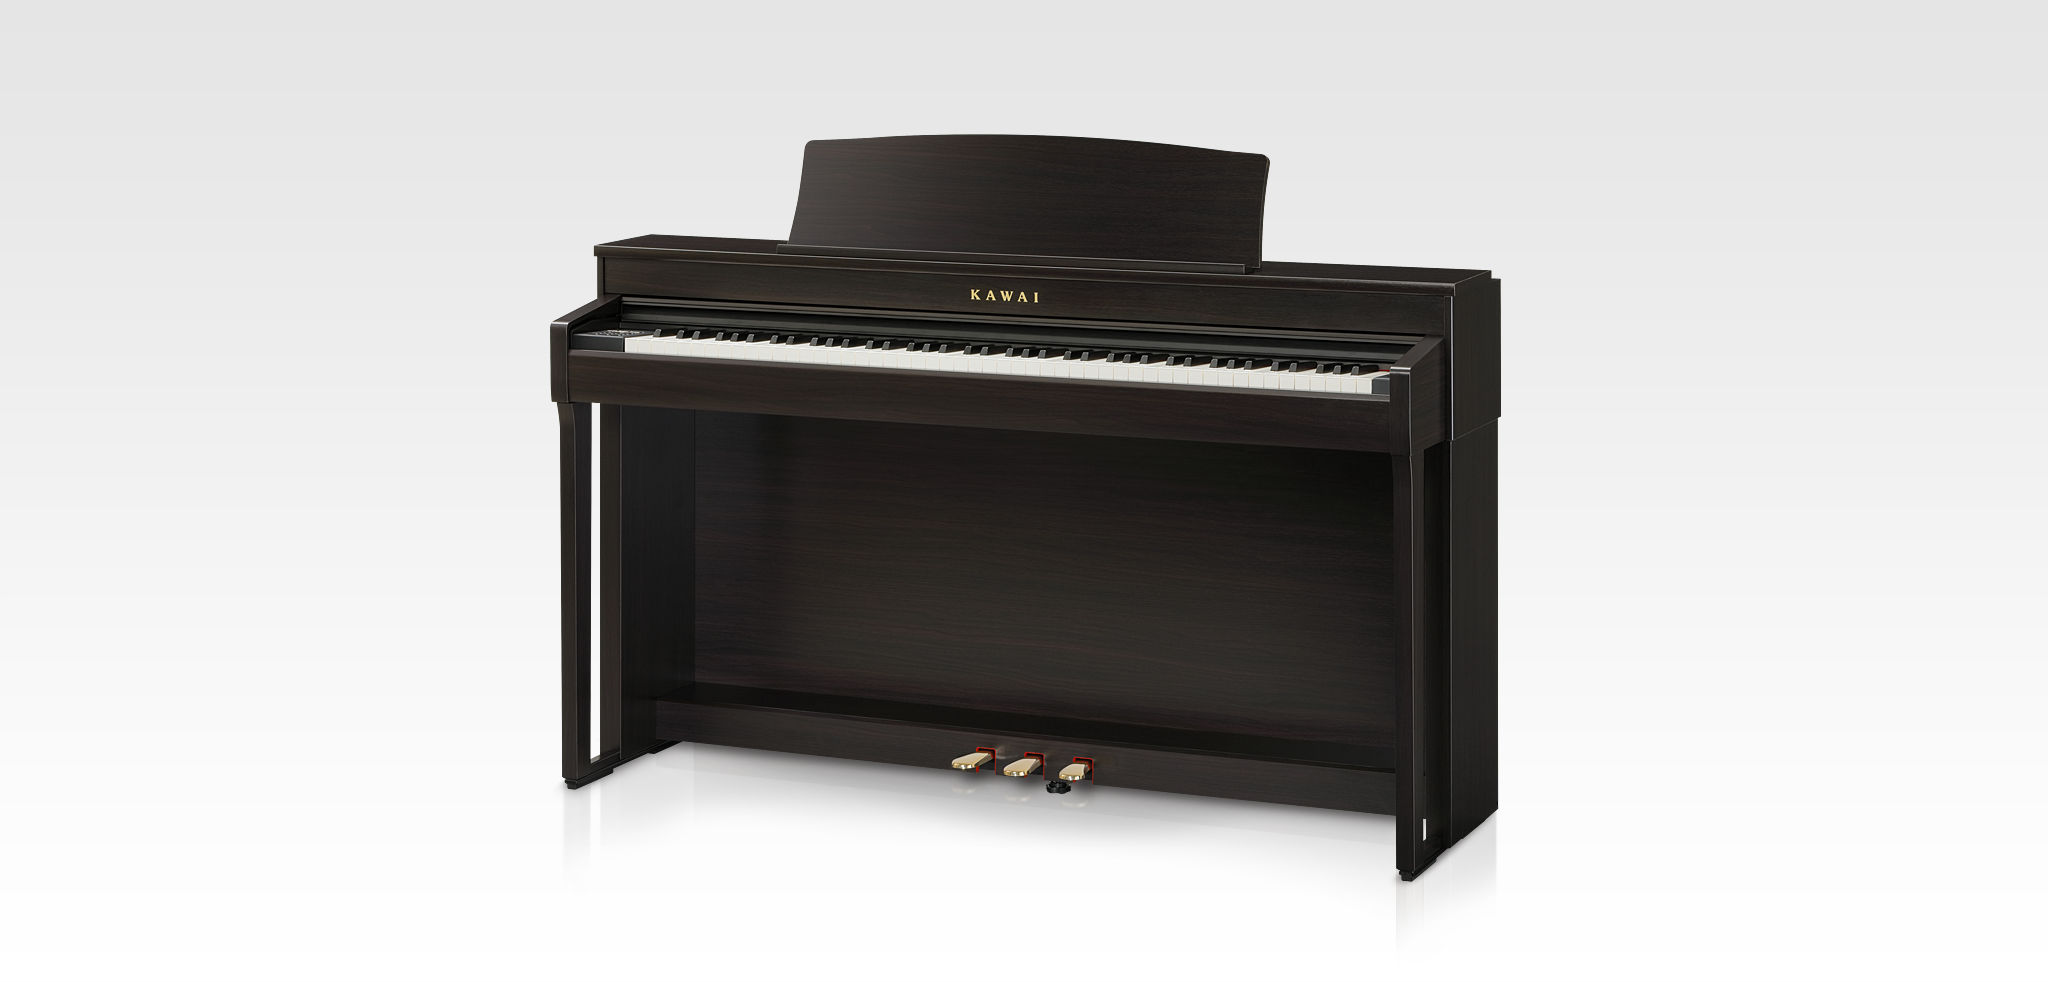 kawai cn39 digital piano rice music house. Black Bedroom Furniture Sets. Home Design Ideas